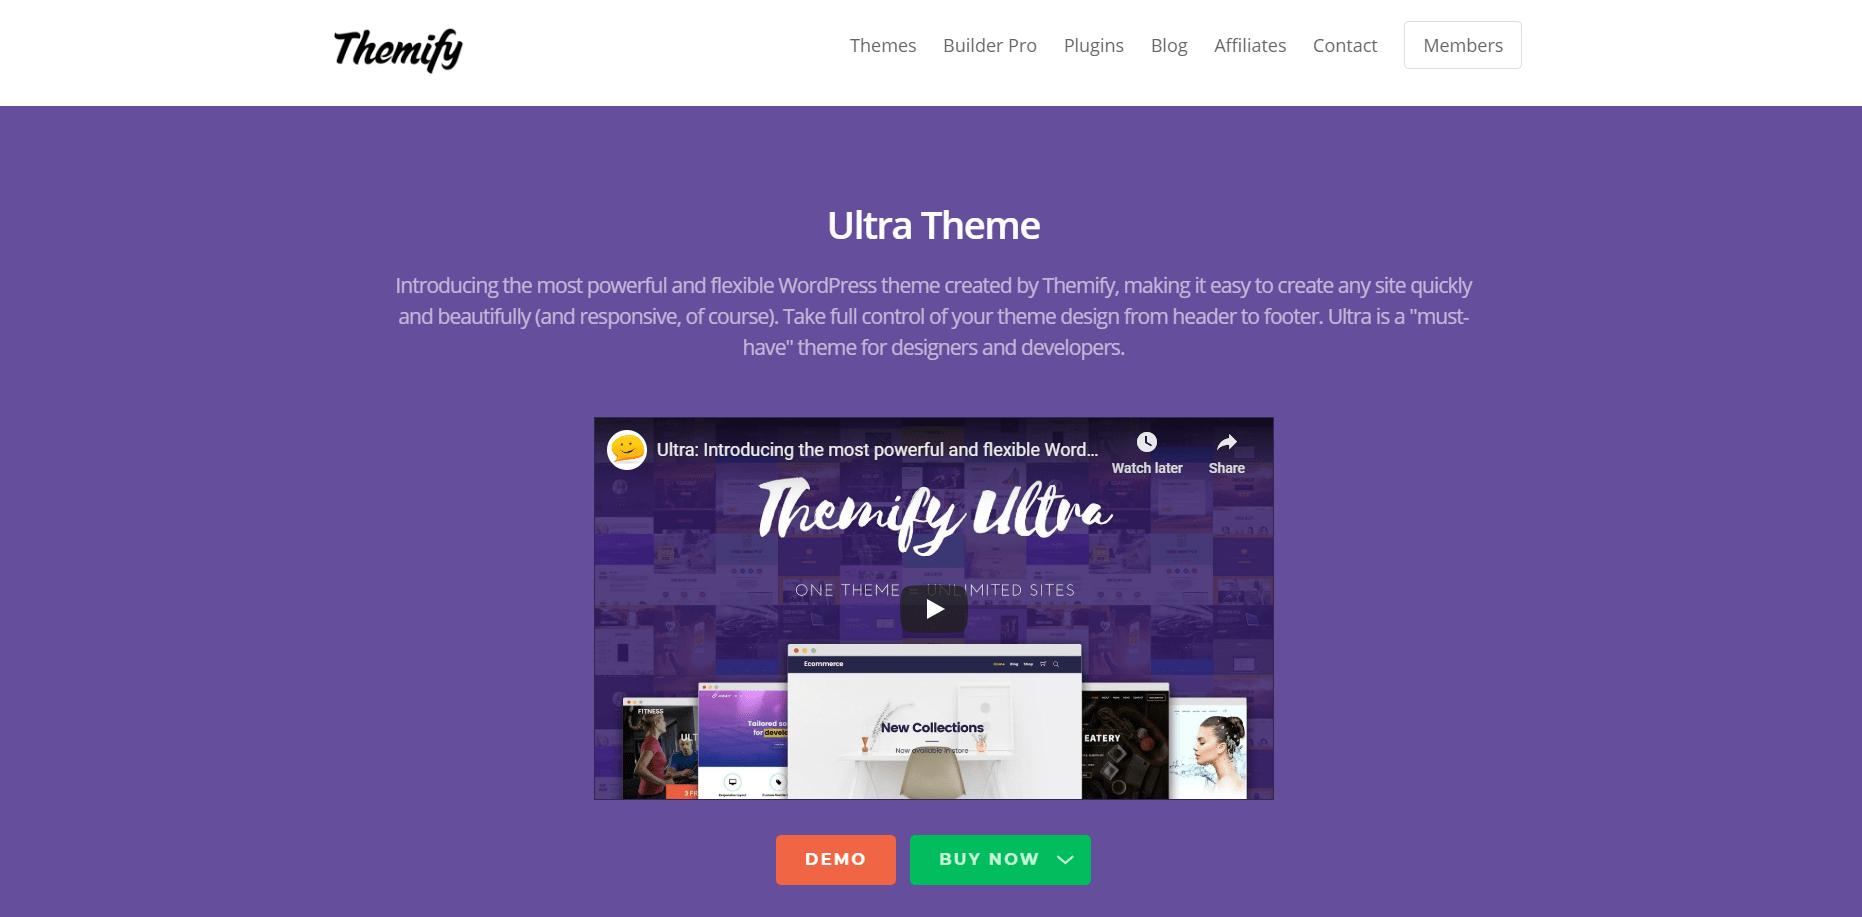 WordPress Multi-purpose themes - Ultra Theme